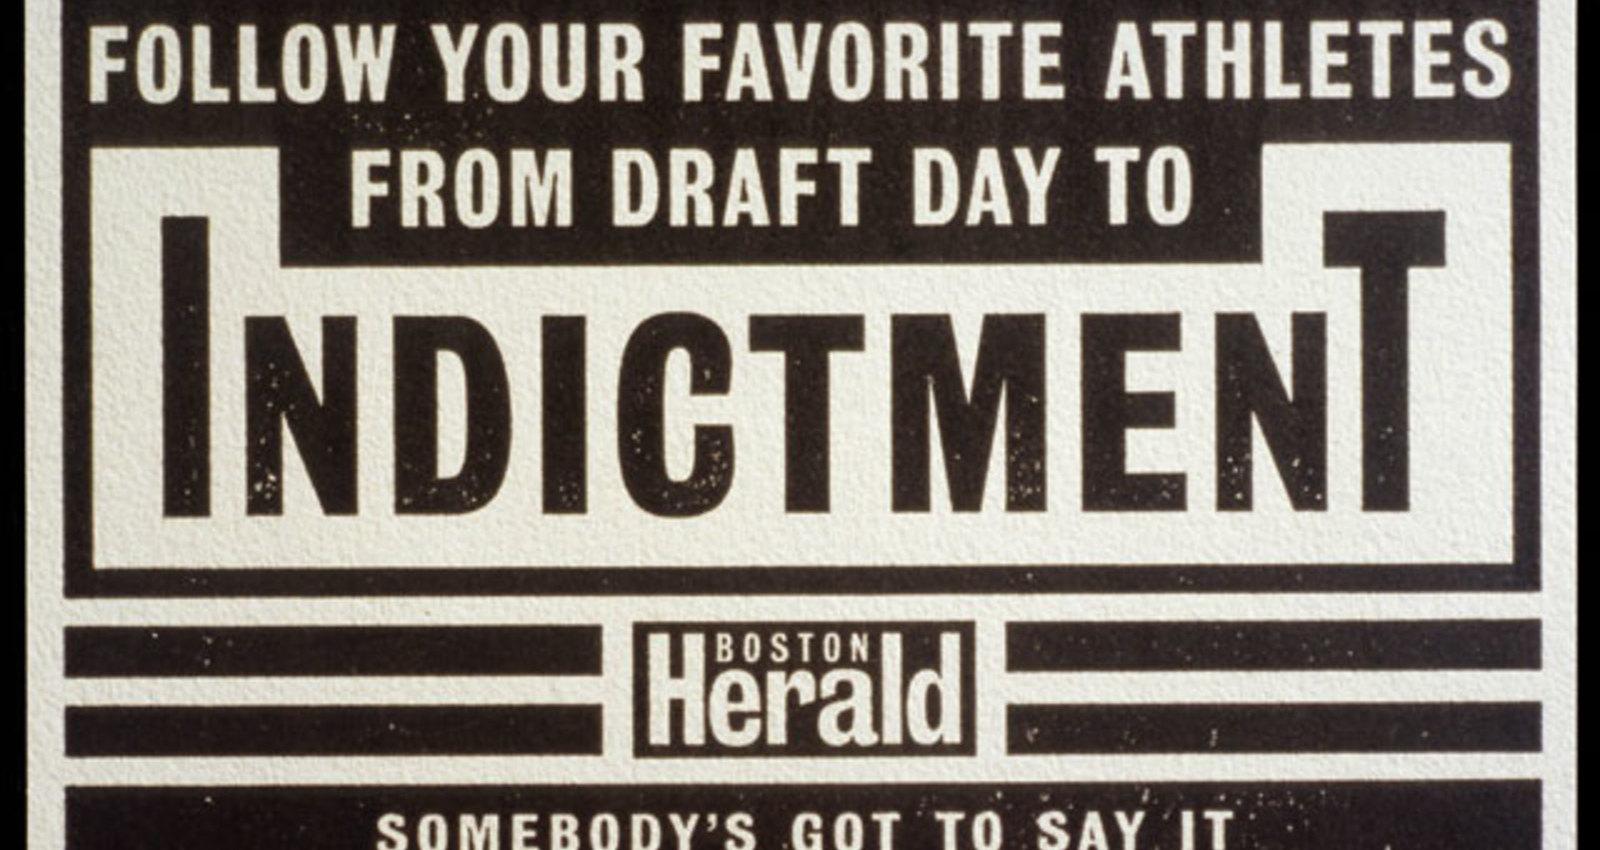 Indictment